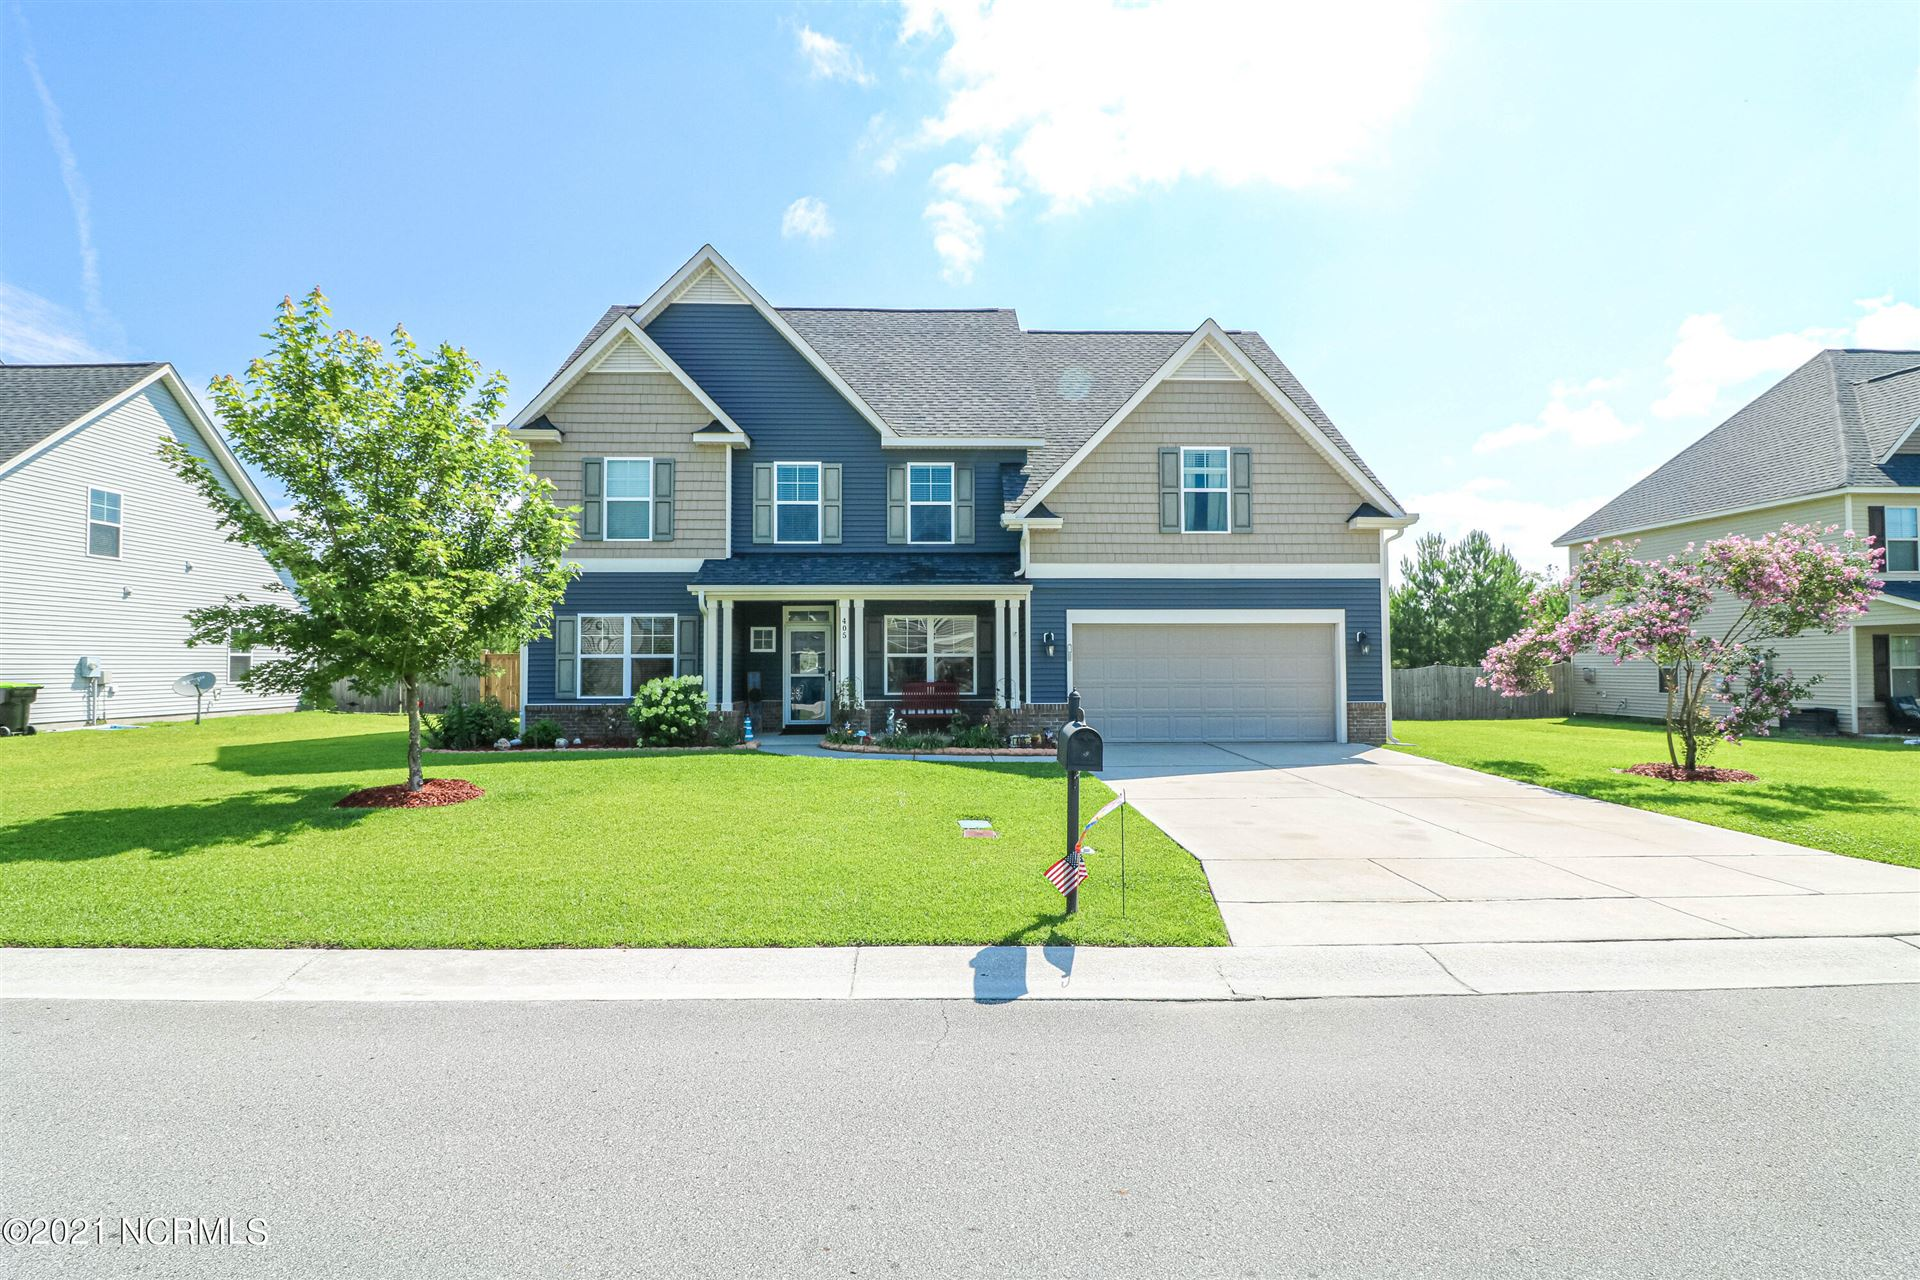 Photo of 405 Cyrus Thompson Drive, Jacksonville, NC 28546 (MLS # 100281458)